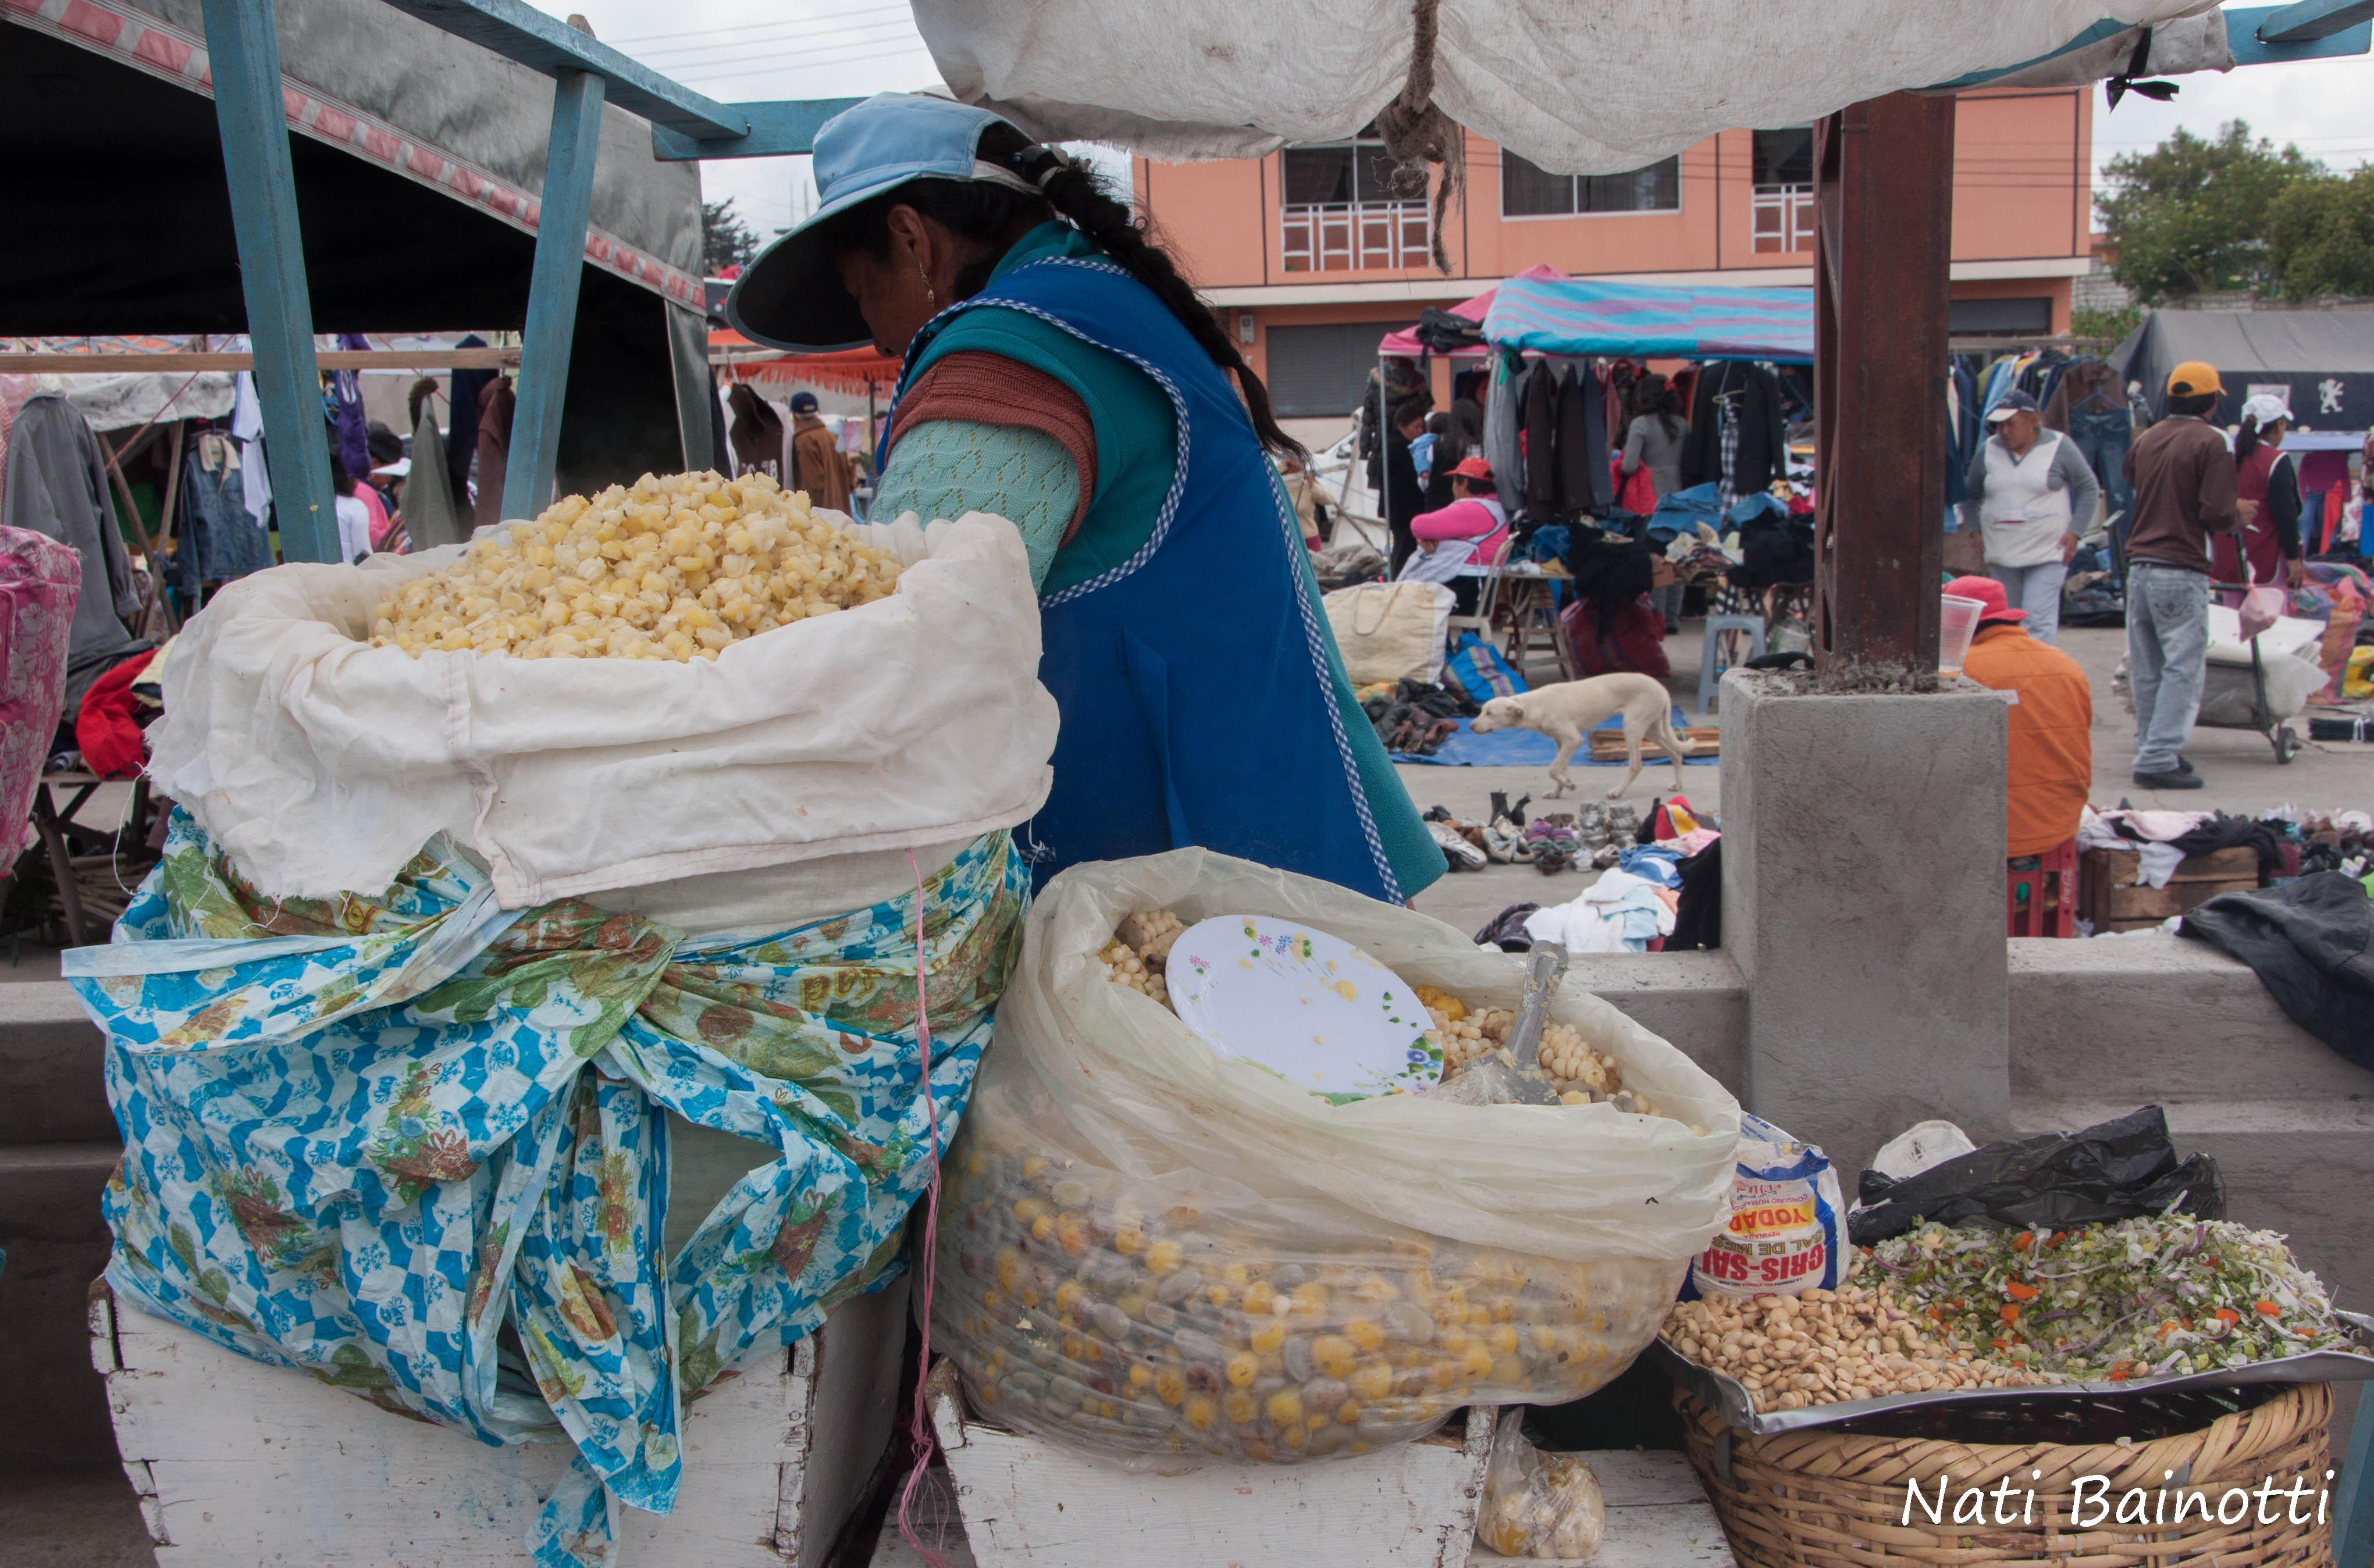 comida-saquisili-ecuador-nati-bainotti-mi-vida-en-una-mochila2